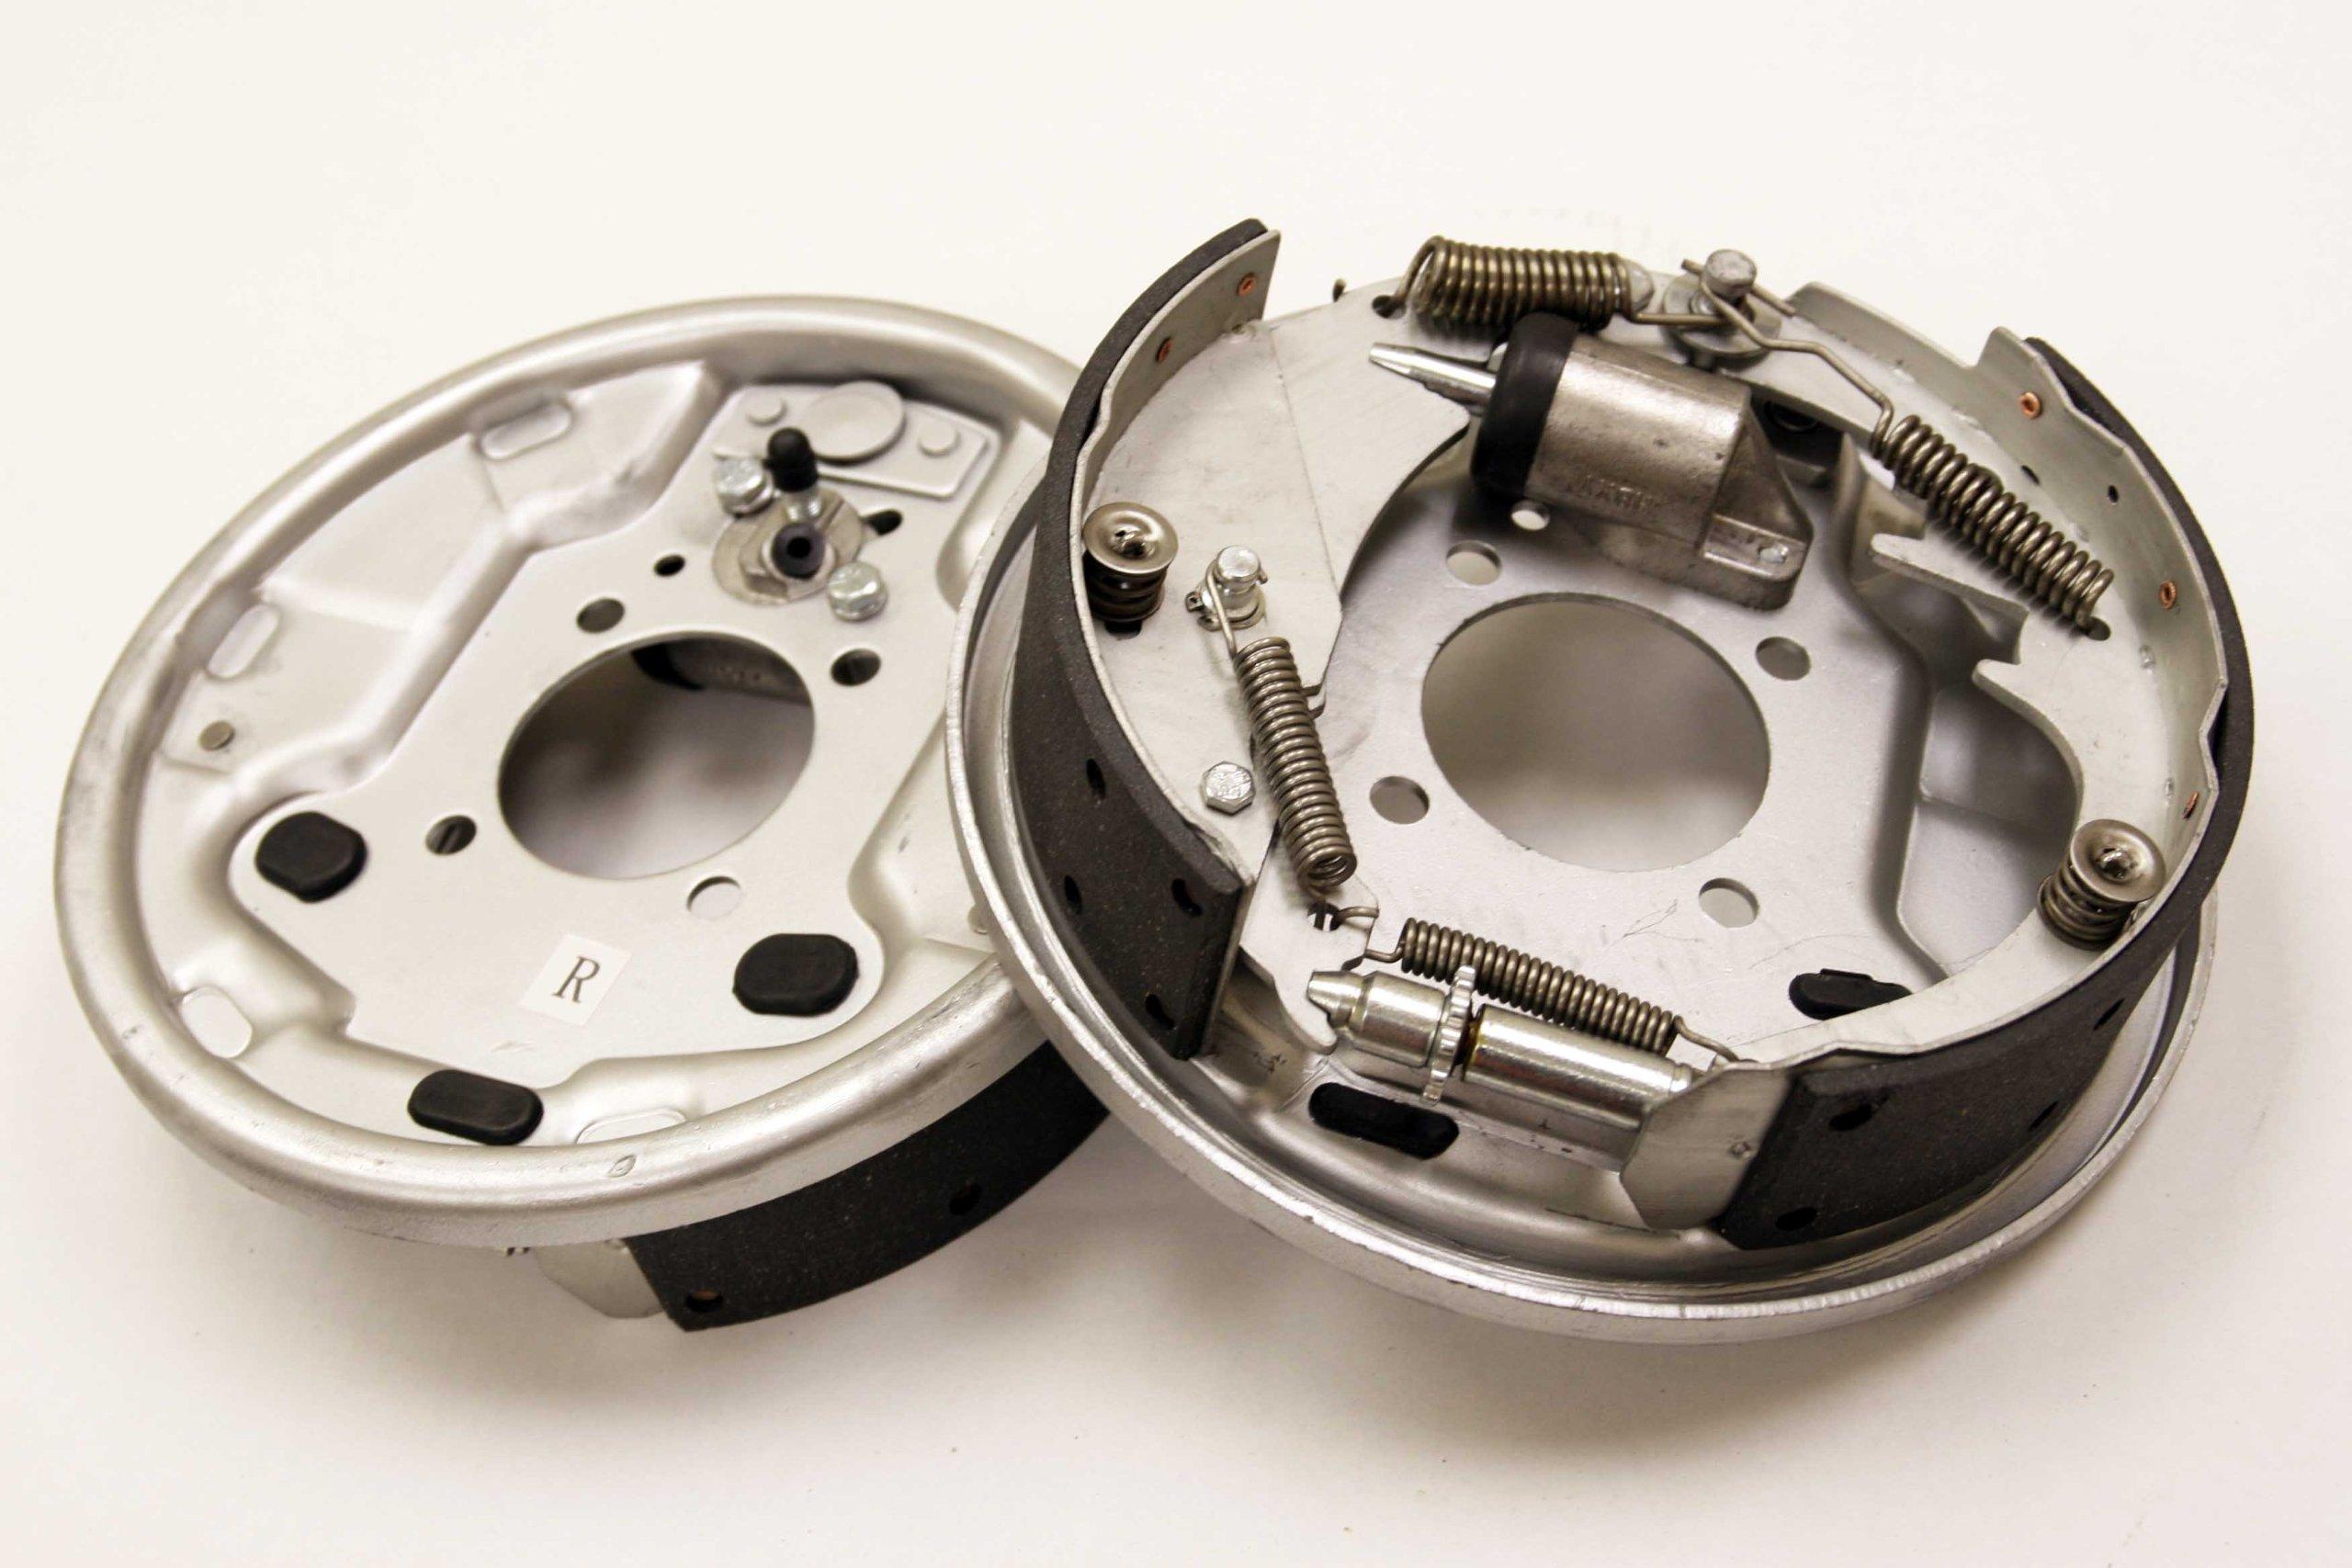 New 10'' x 2-1/4'' Trailer Hydraulic Free Backing Marine Brake Assembly Pair Set - 21016 by Highton